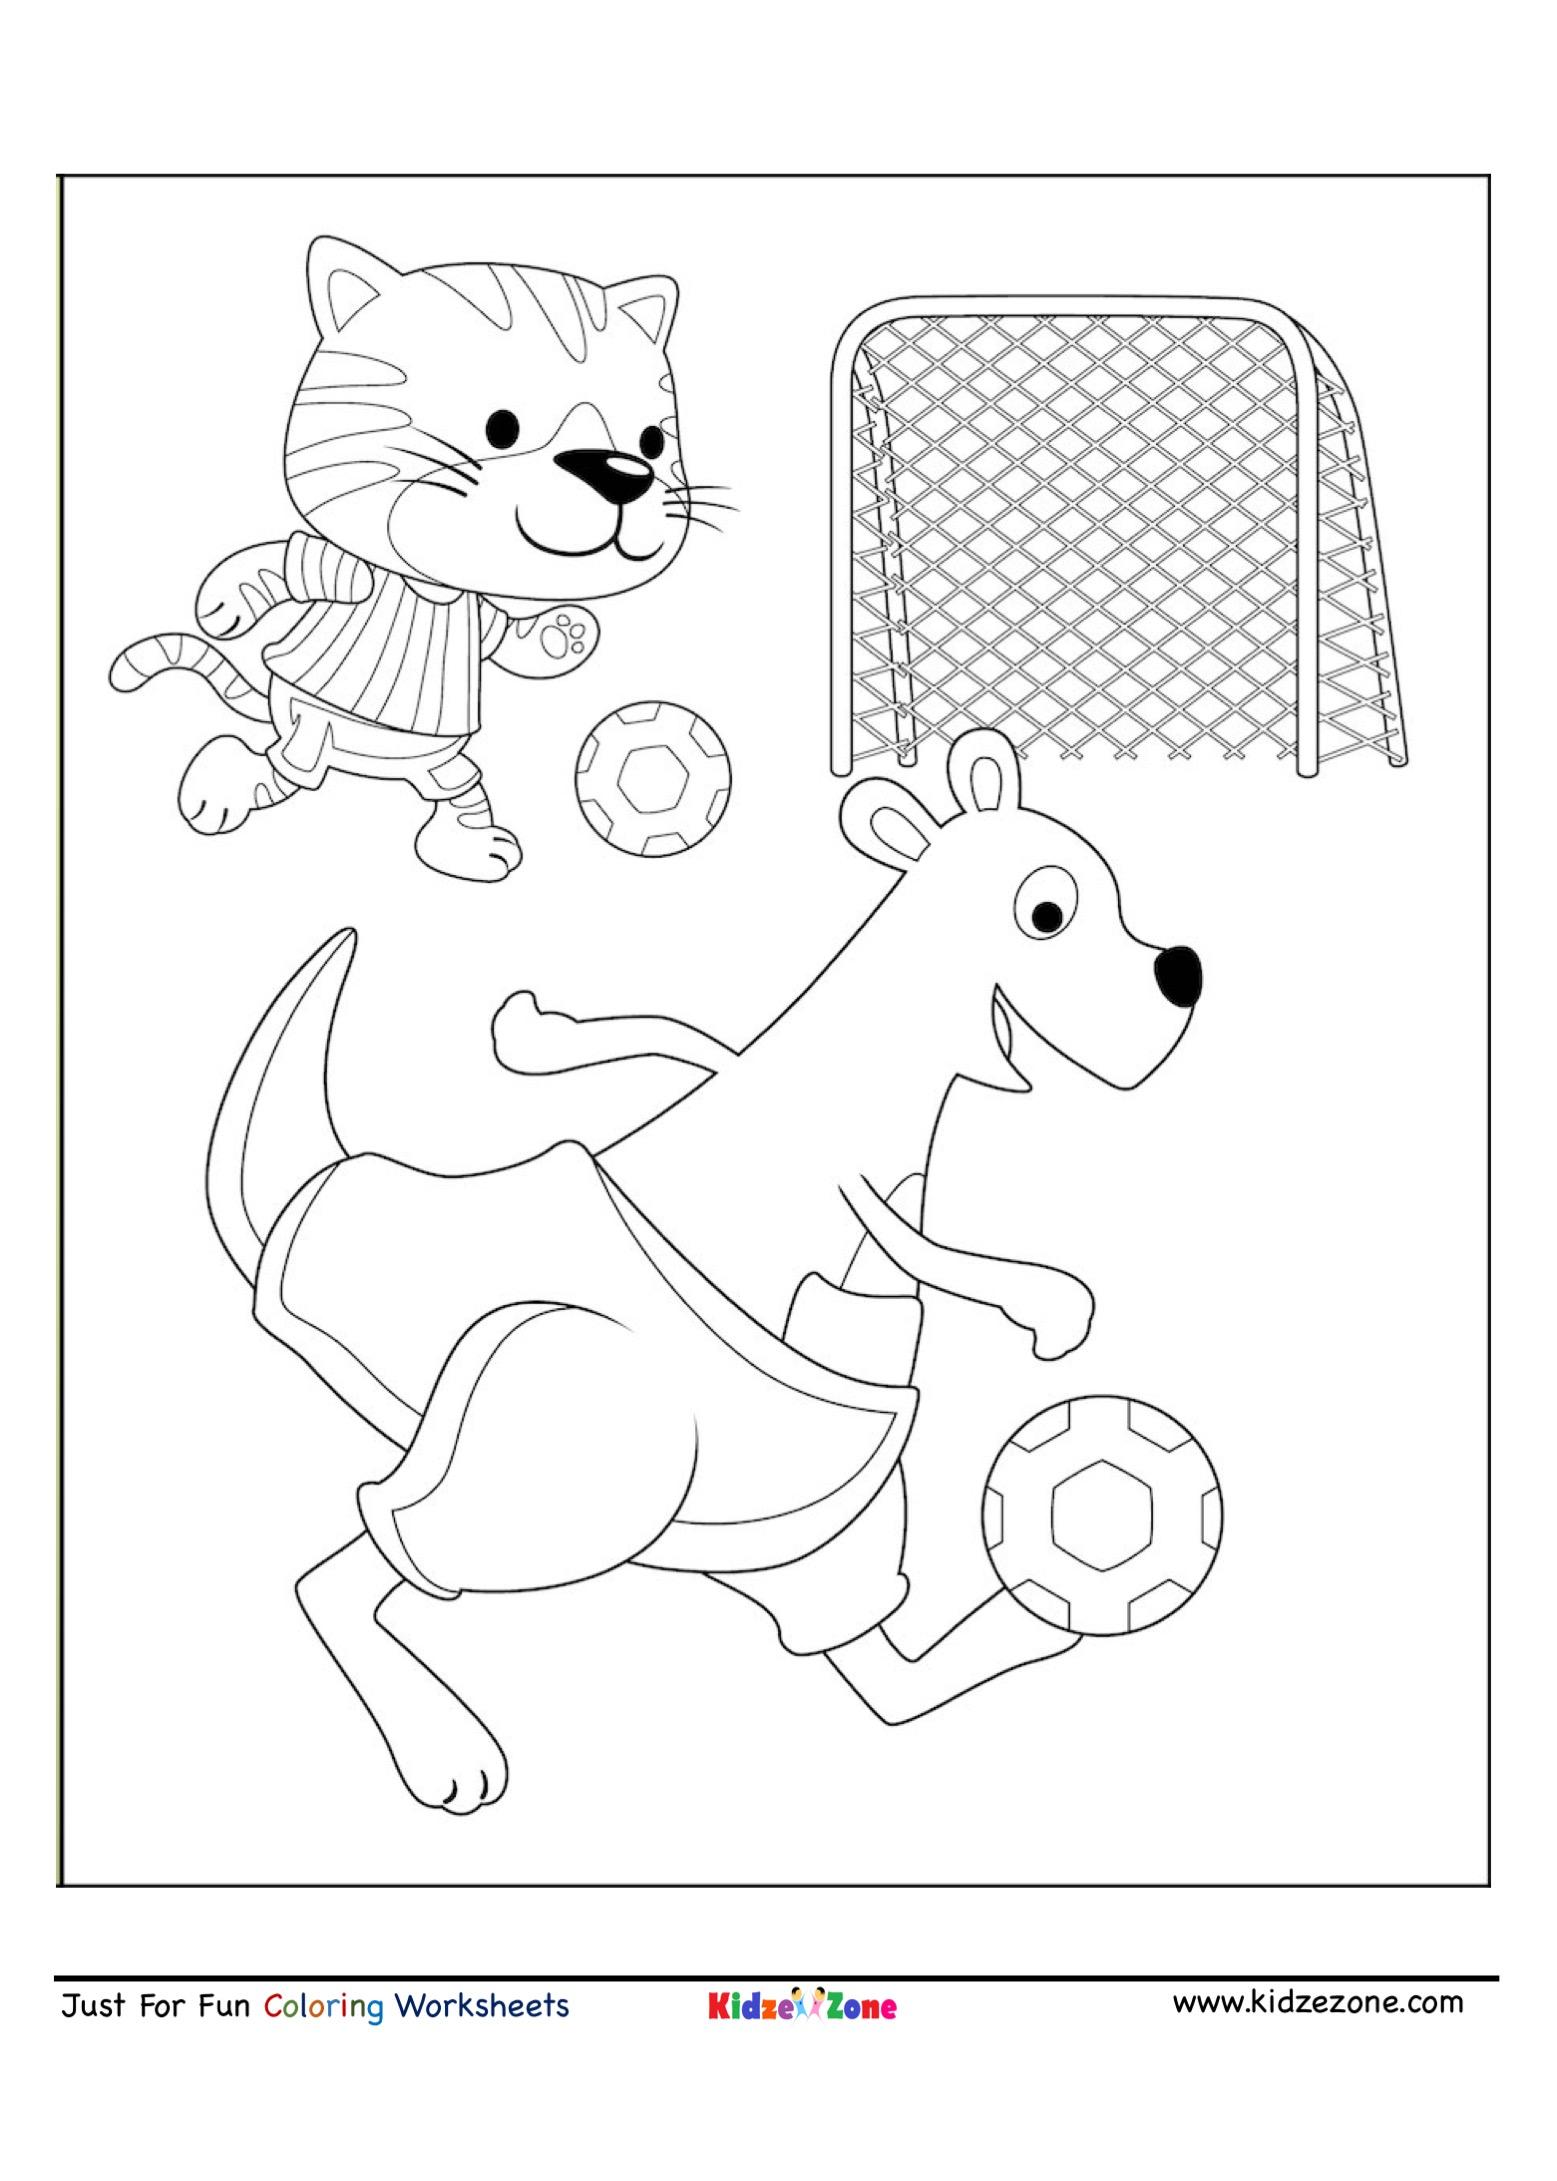 Kangaroo And Tiger Soccer Coloring Page